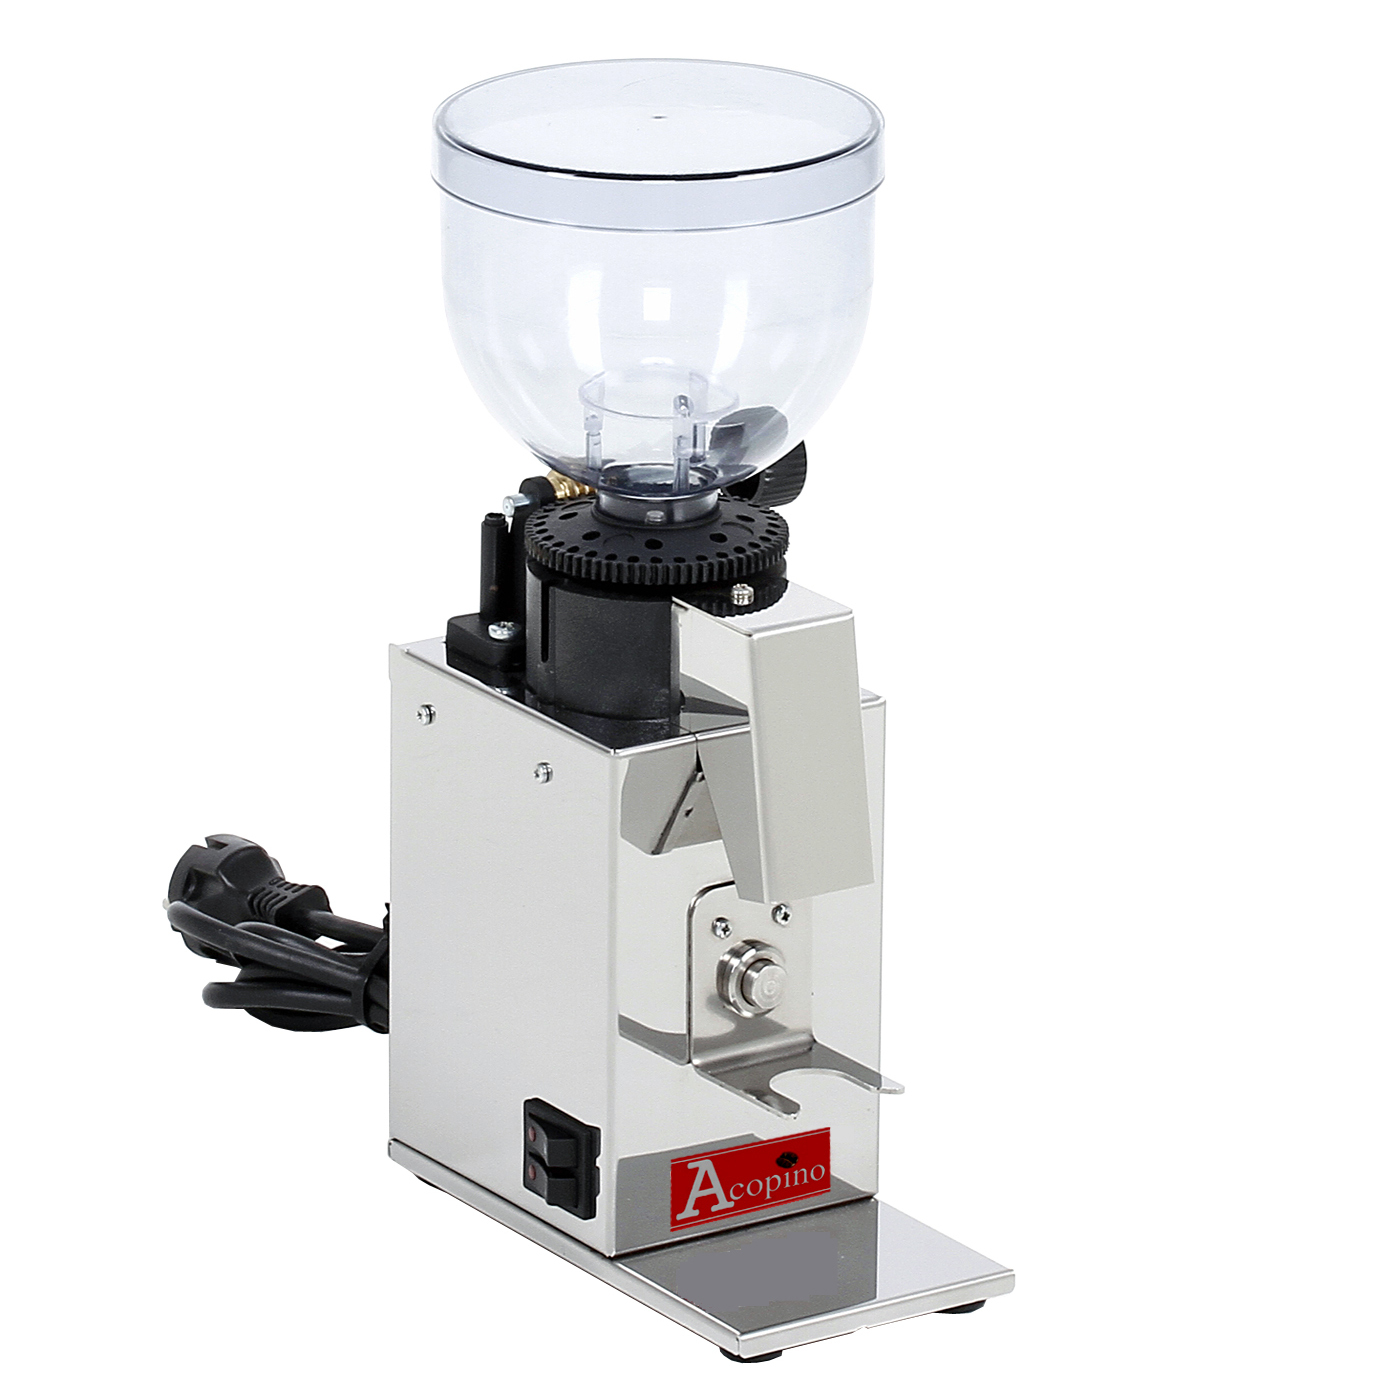 acopino arona elektrische kaffeem hle mit kegelmahlwerk. Black Bedroom Furniture Sets. Home Design Ideas